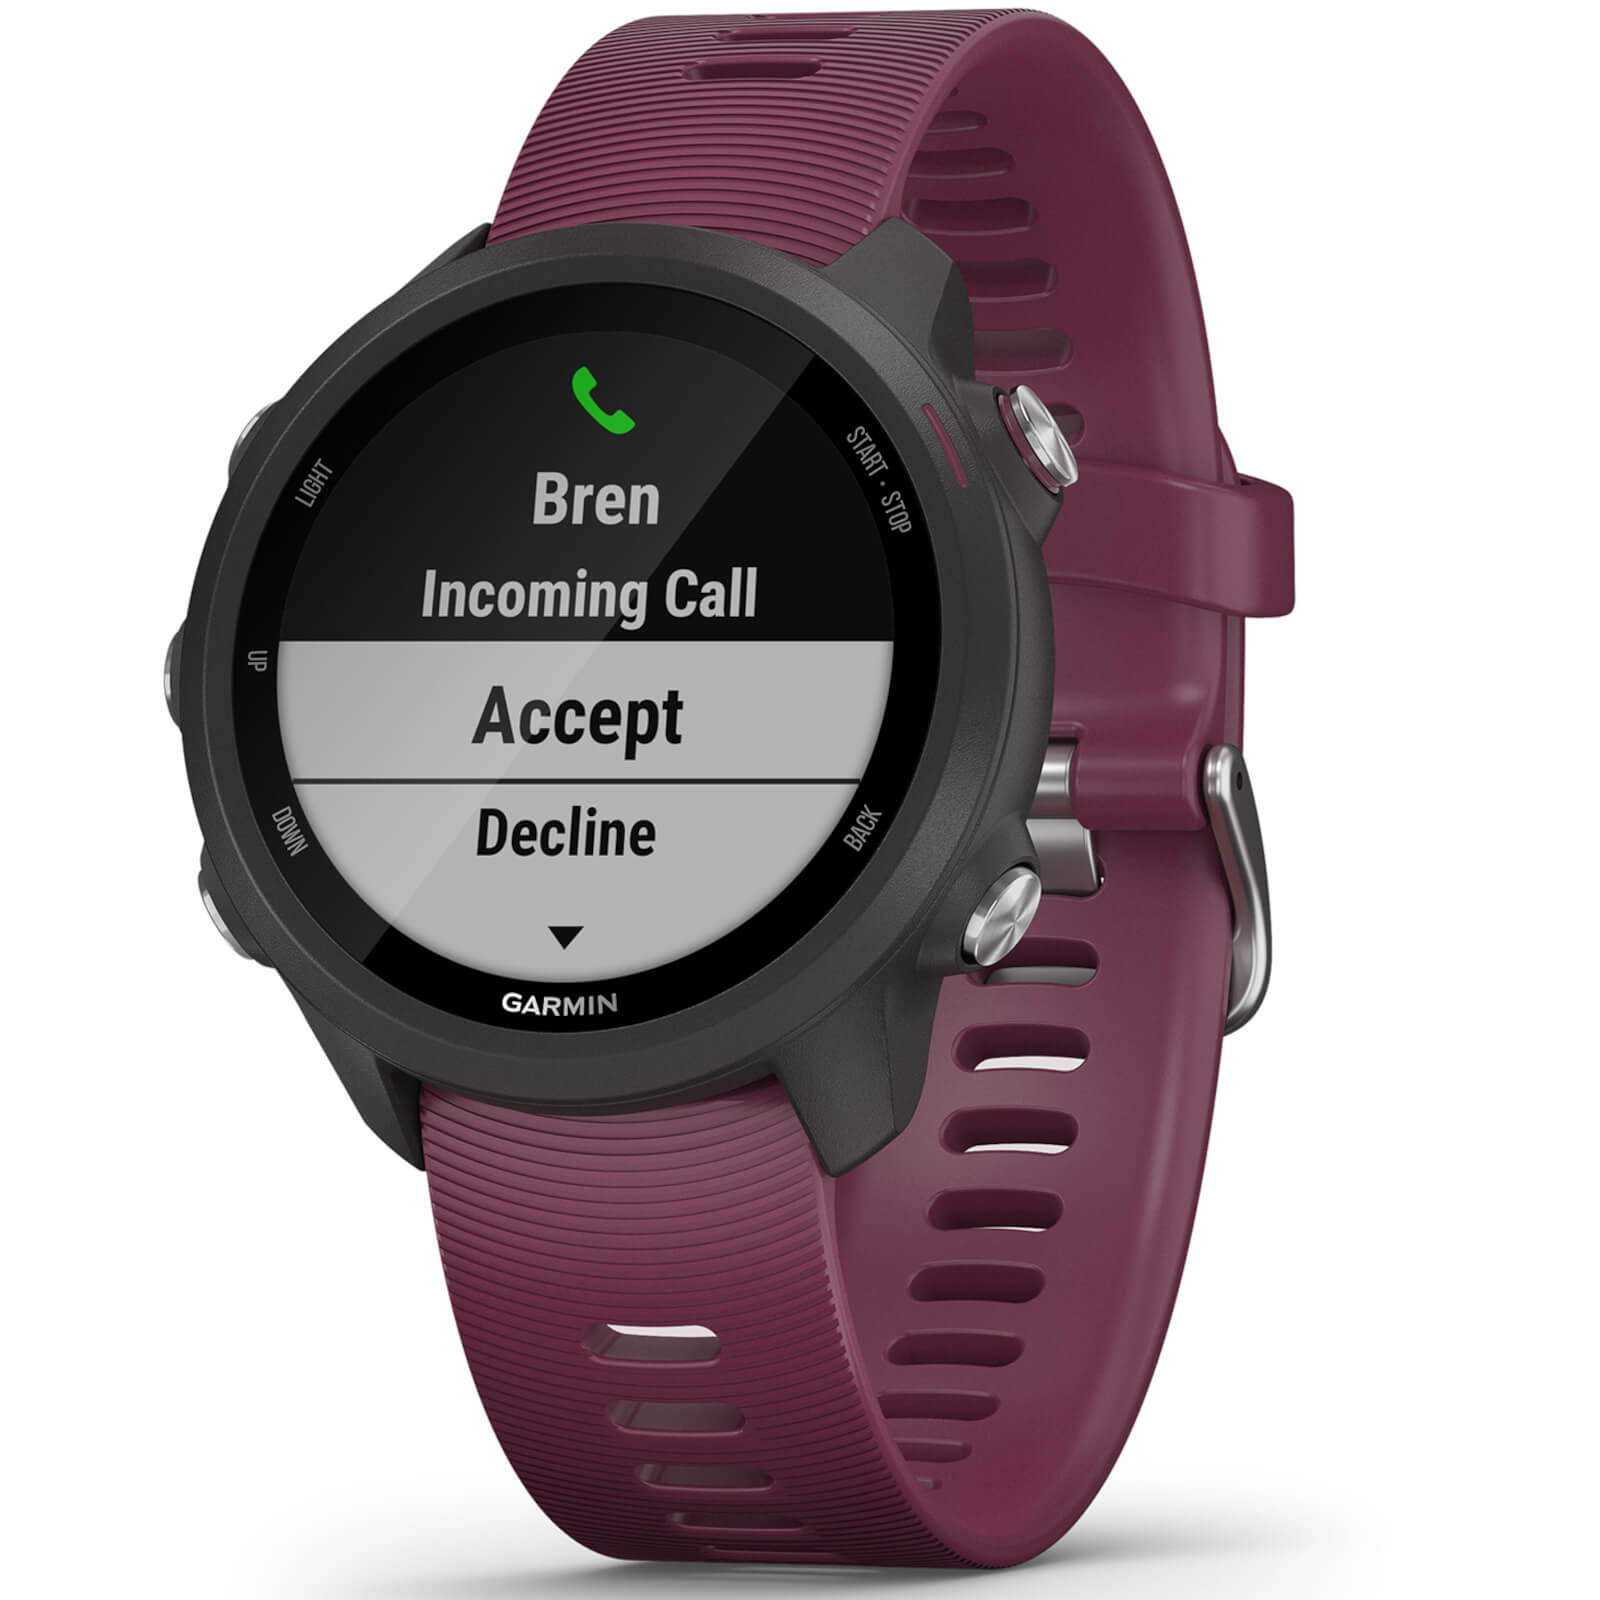 Garmin Forerunner 245 Running Watch - Black/Berry